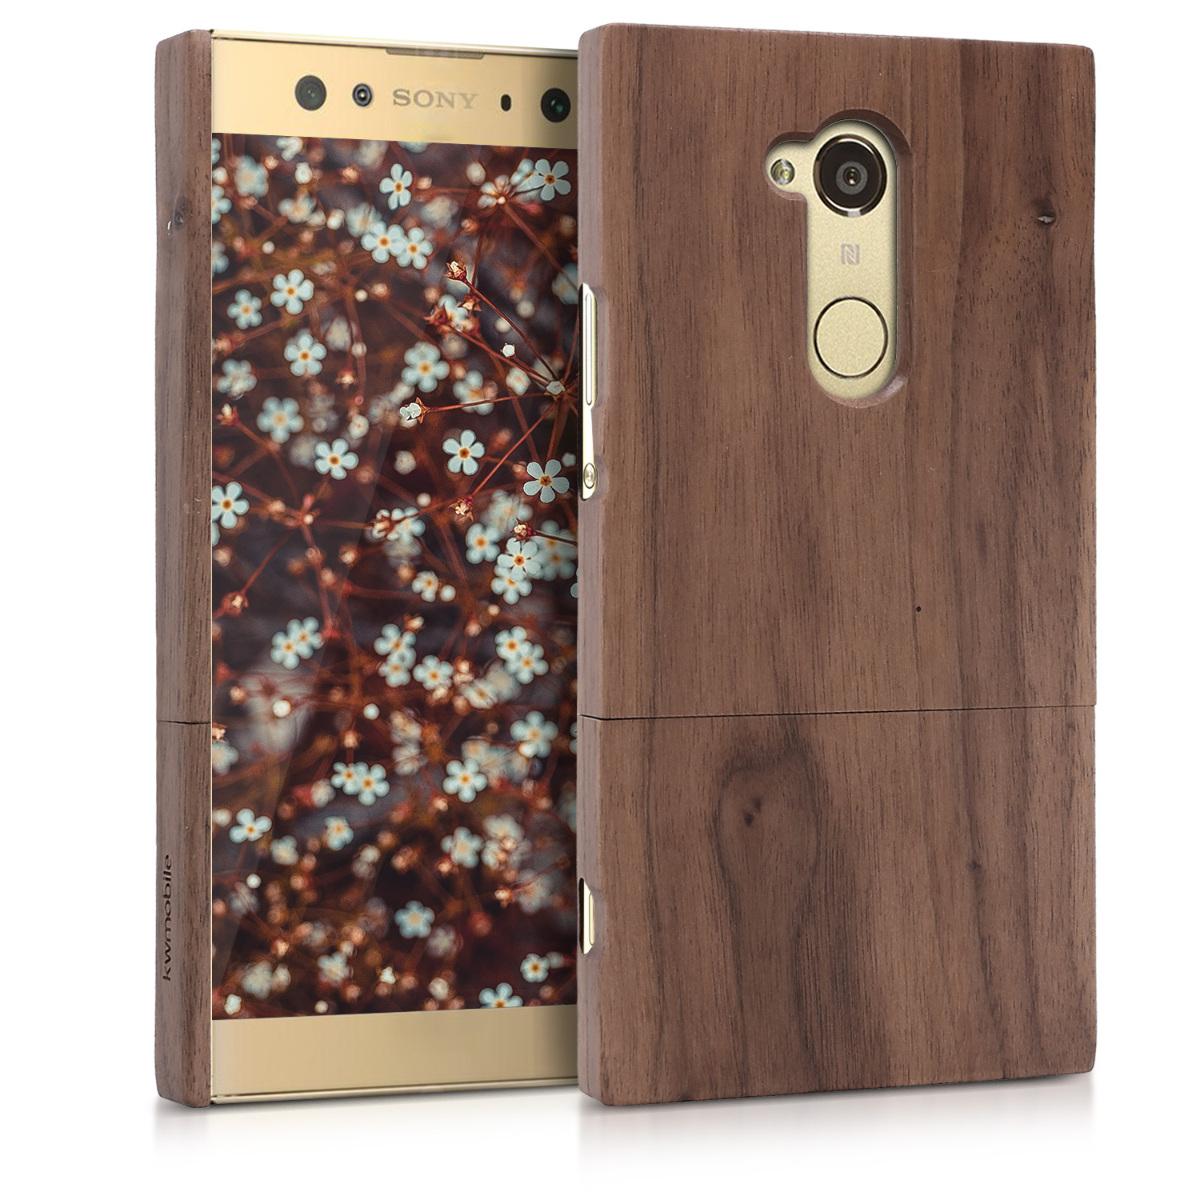 Dřevěné pouzdro | obal pro Sony Xperia XA2 Ultra -